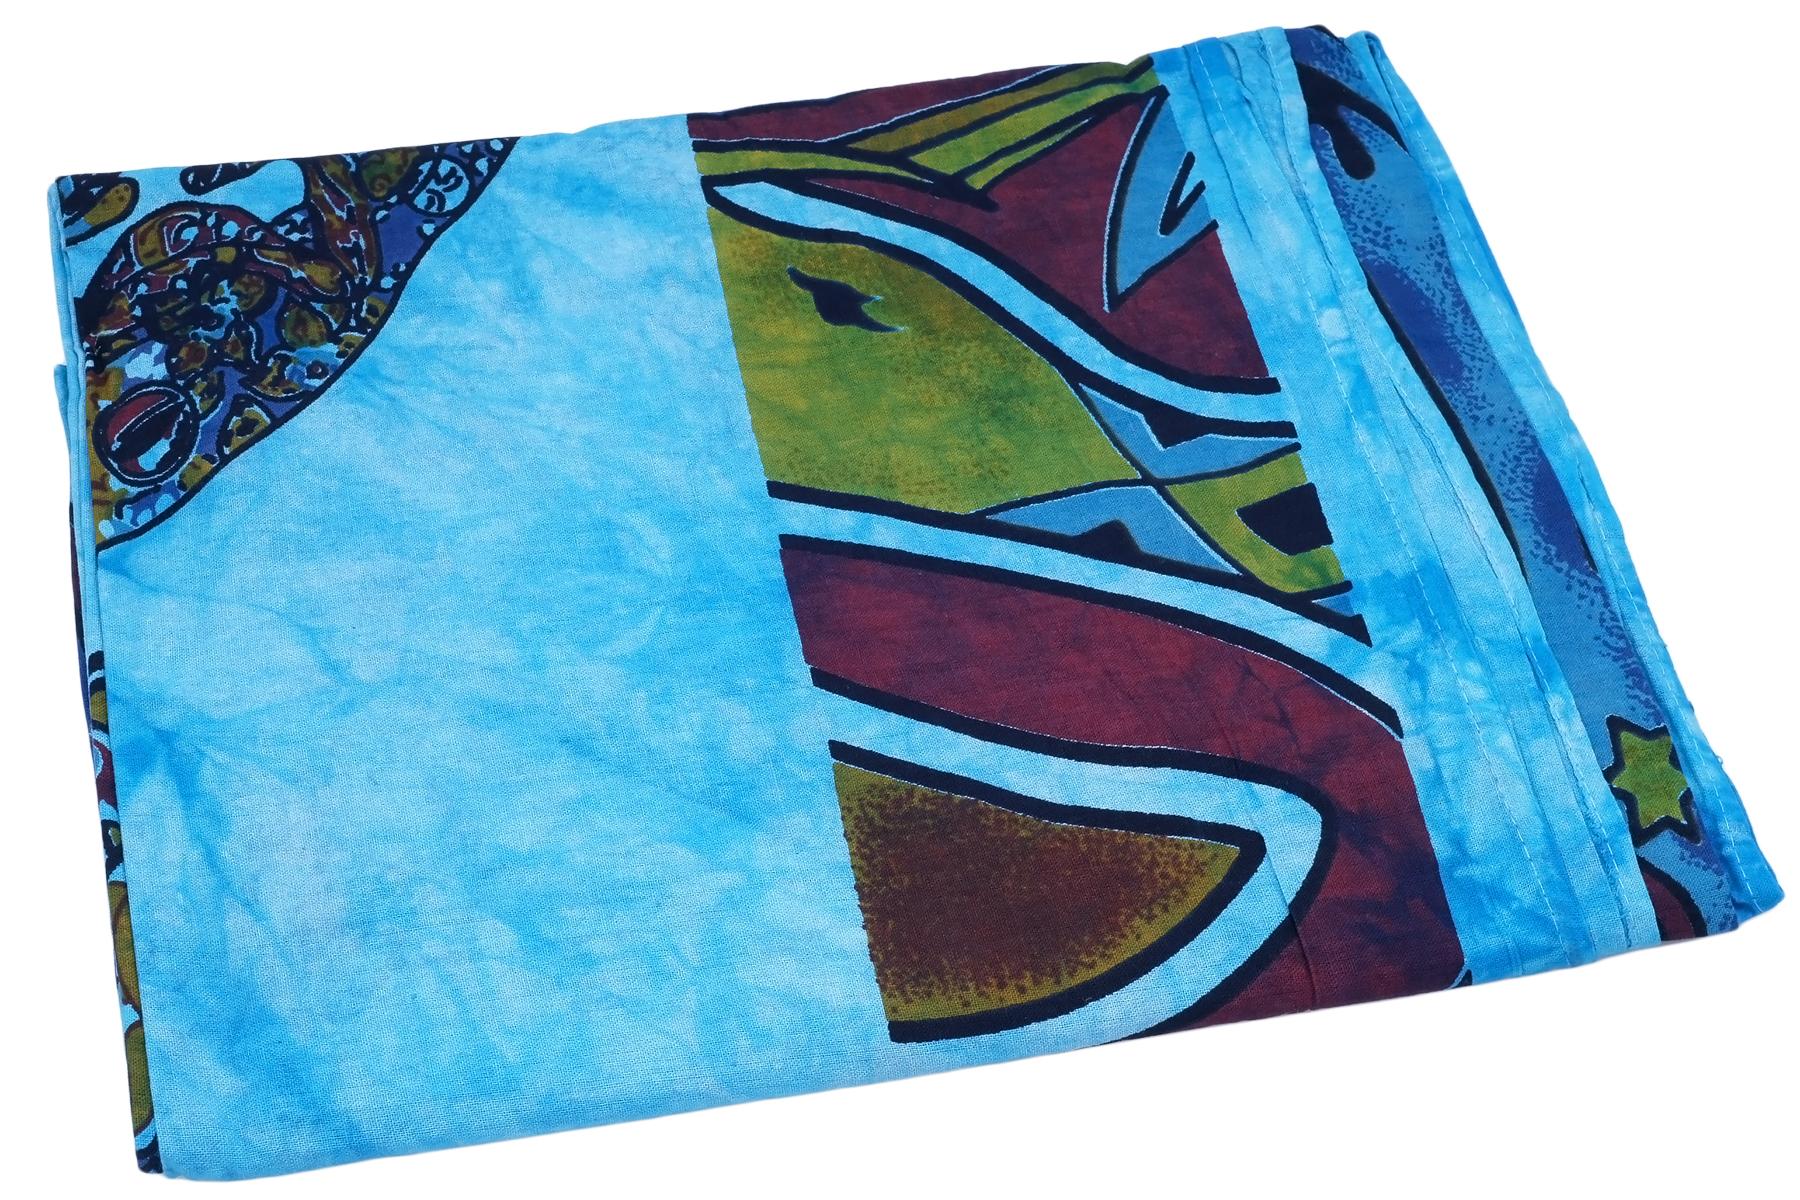 Пледы и покрывала Ethnic Chic Покрывало Luisa Цвет: Голубой (215х130 см) luisa moretti костюм для дома selina цвет голубой l